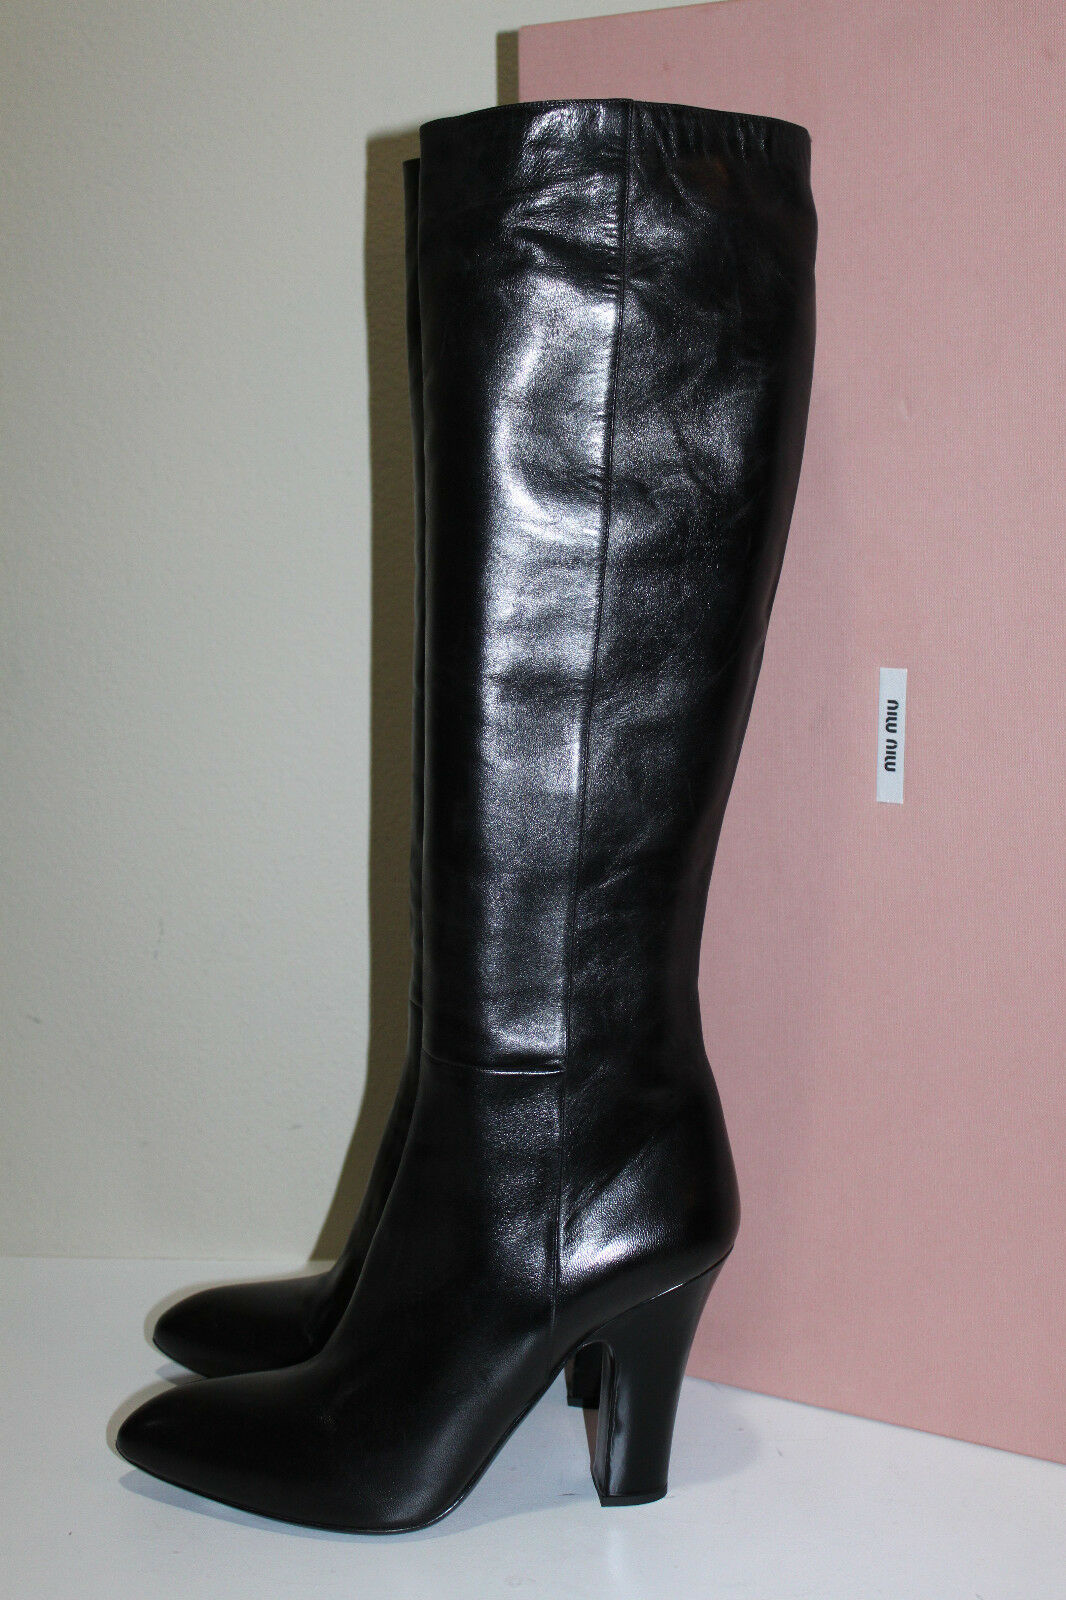 New Miu Miu / Prada Black Leather Tall Boot Pointed Toe Heel Shoes sz 7 / 37